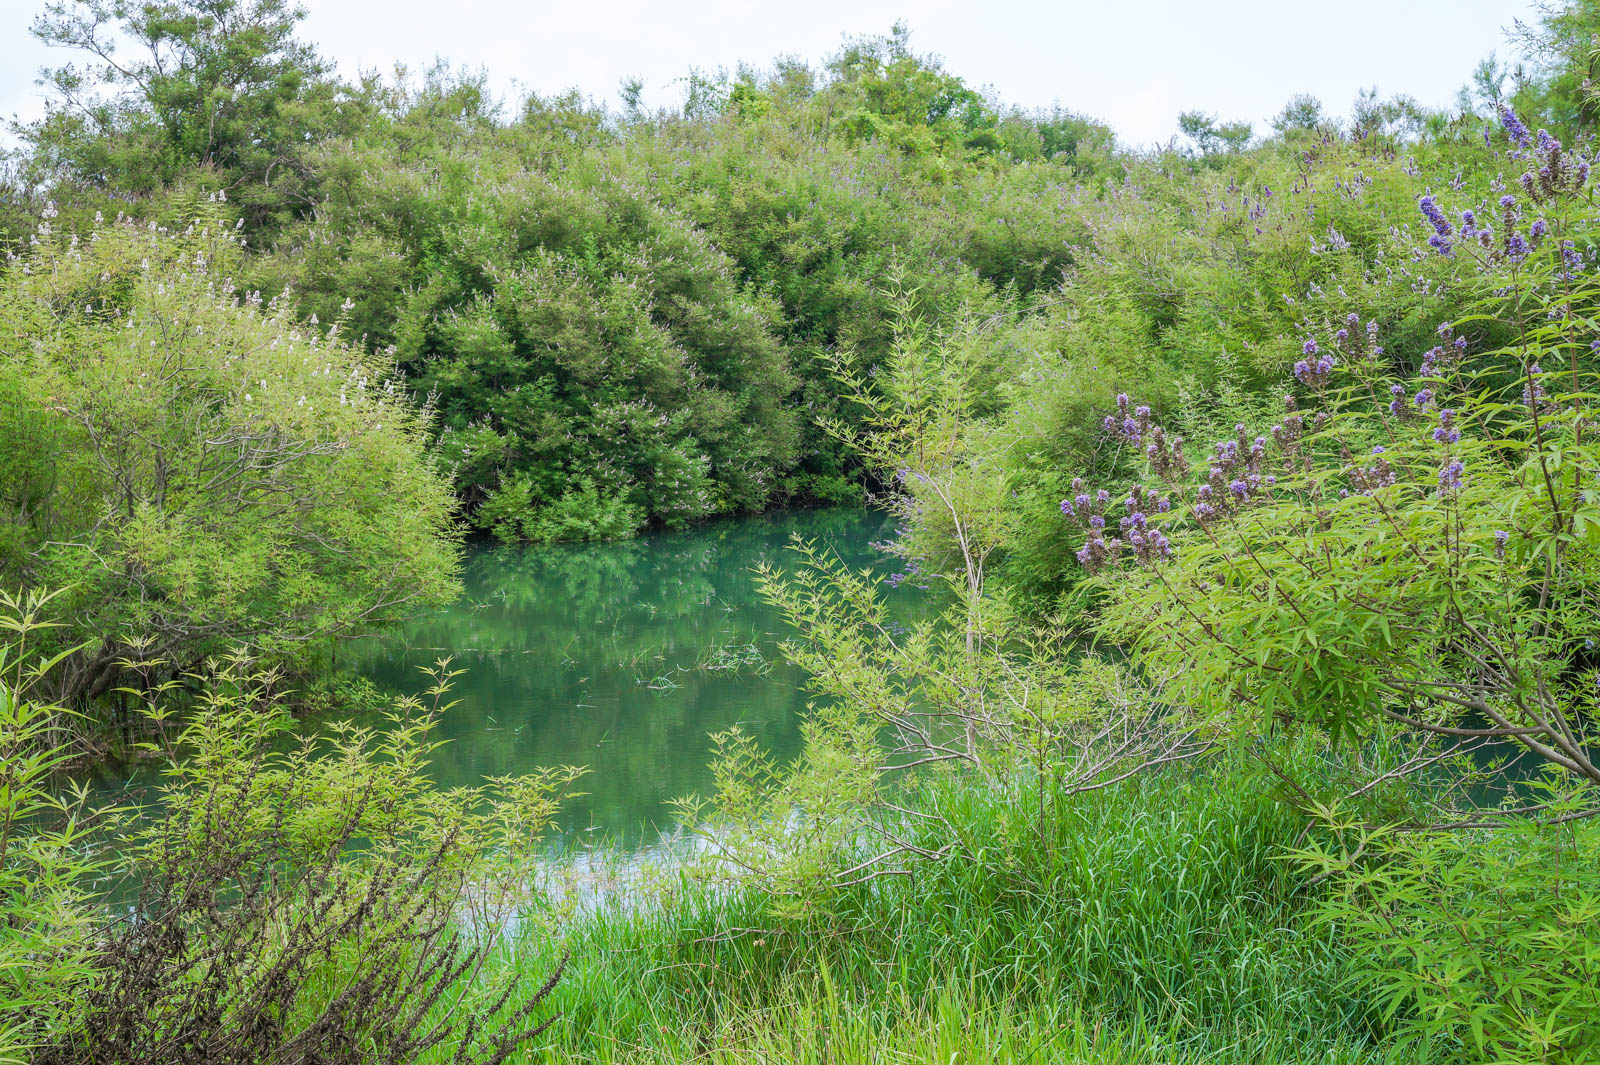 kourna-lake-crete-greece-la-vie-en-blog-all-rights-reserved